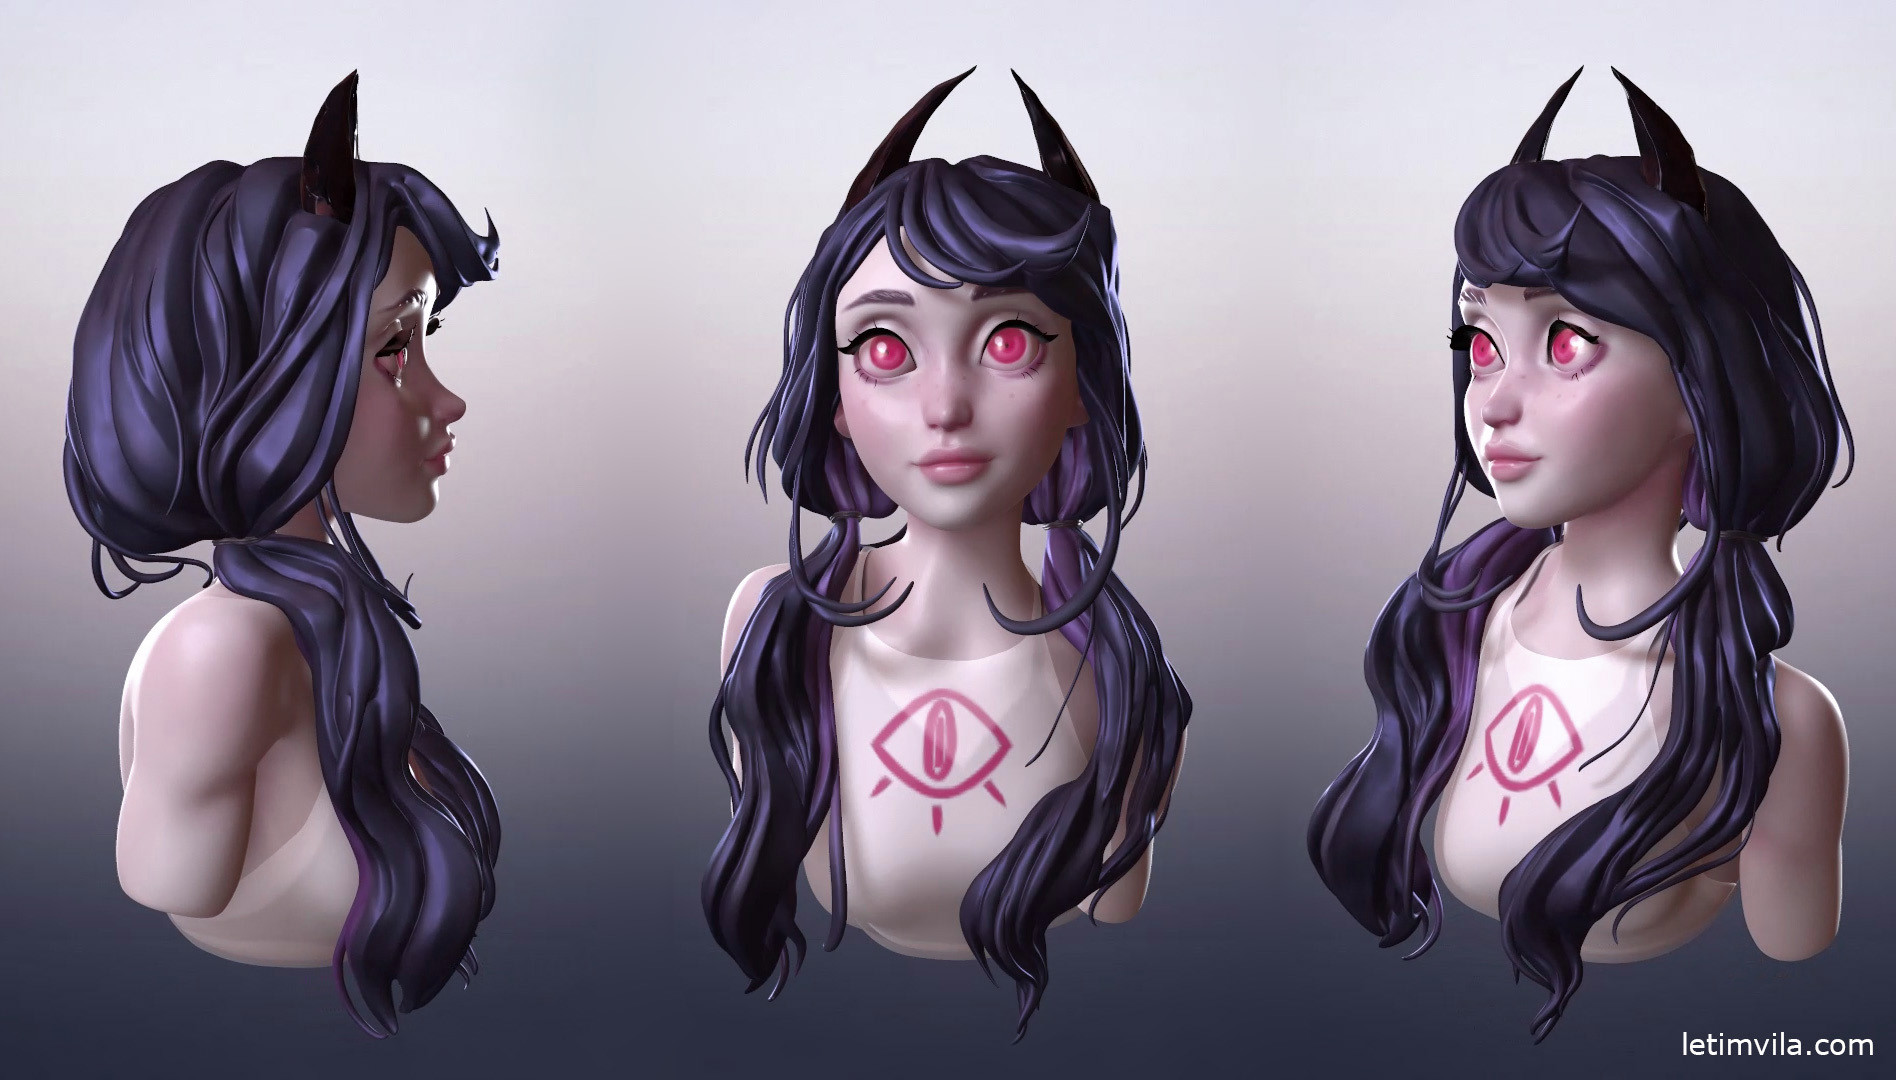 Demon girl, marmoset render views